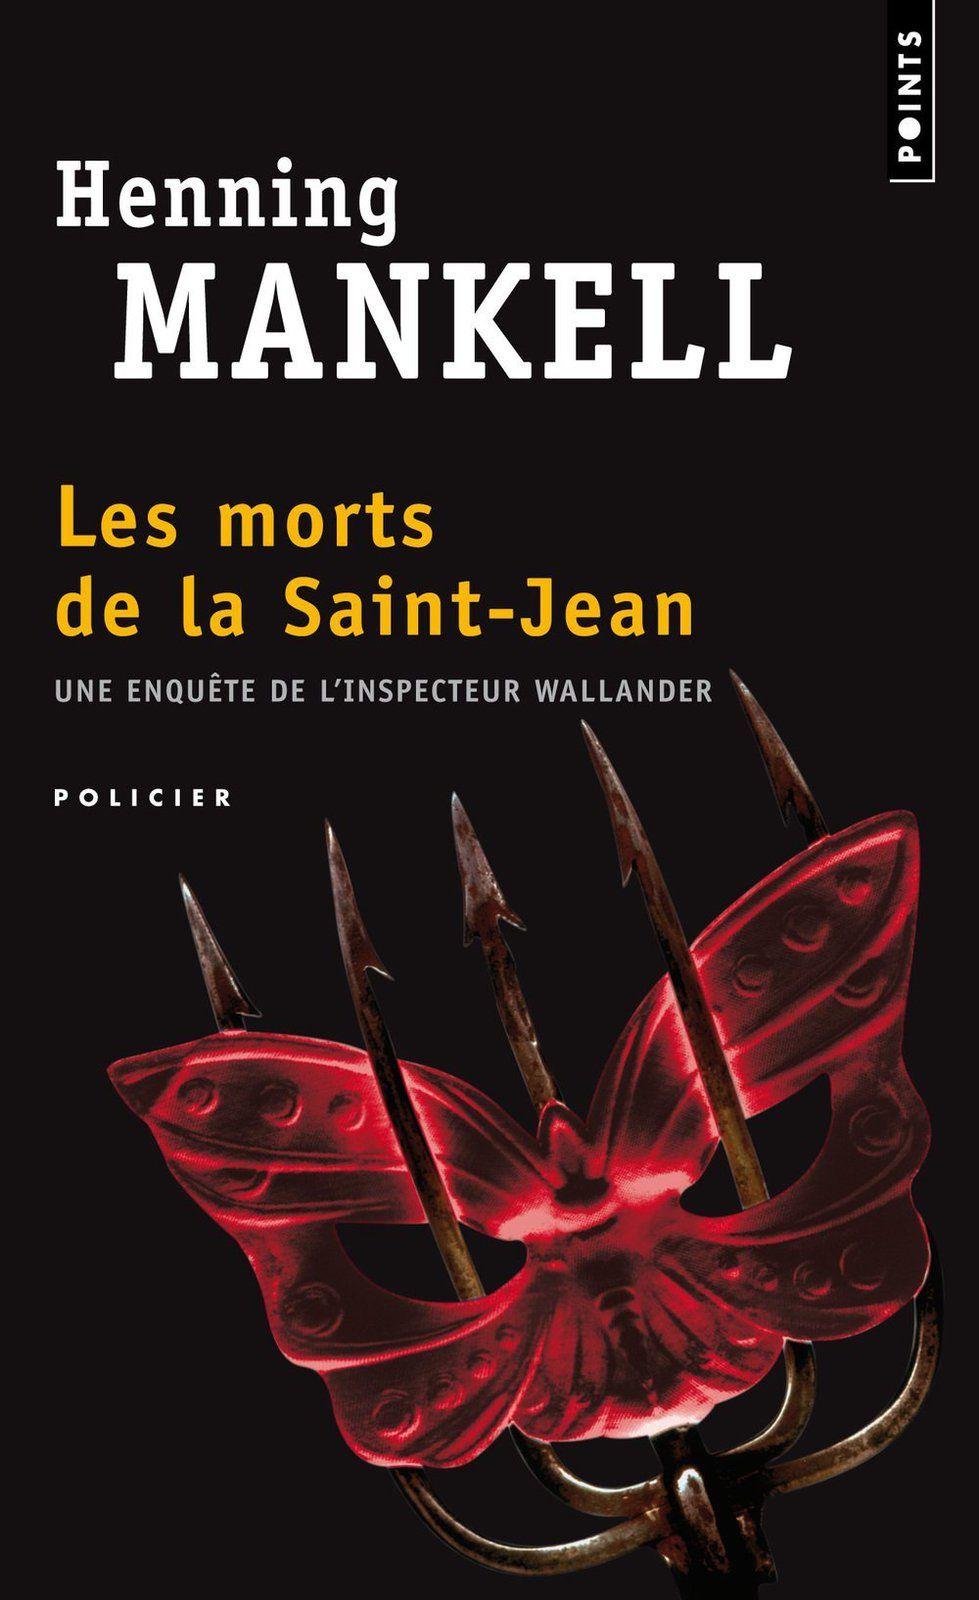 Les morts de la Saint-Jean - Henning MANKELL (Steget efter, 1997), traduction de Anna Gibson, Seuil collection Points, 2002, 576 pages